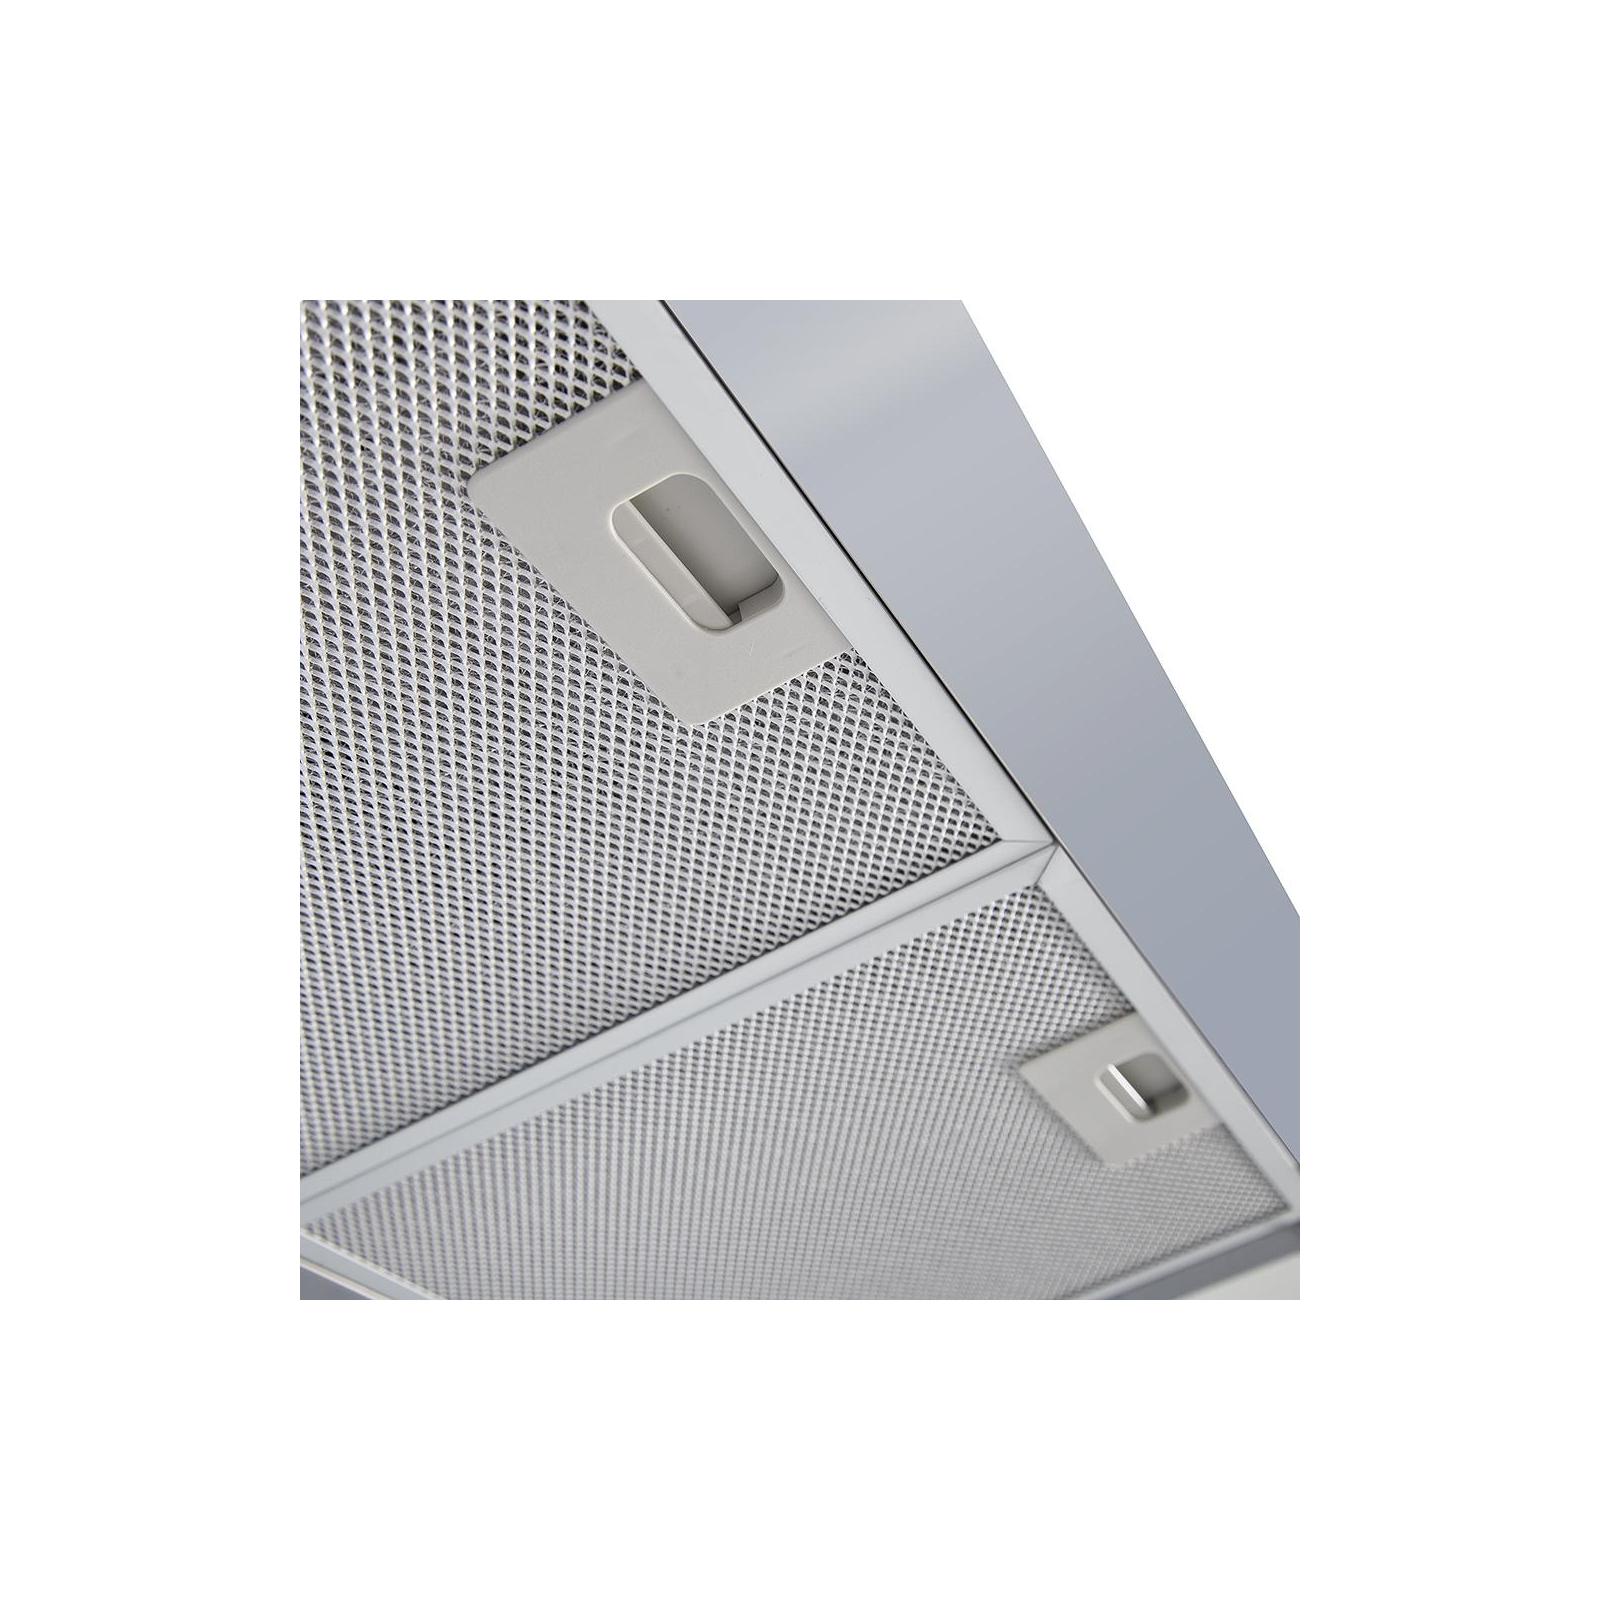 Вытяжка кухонная PERFELLI TET 6612 A 1000 I LED изображение 5